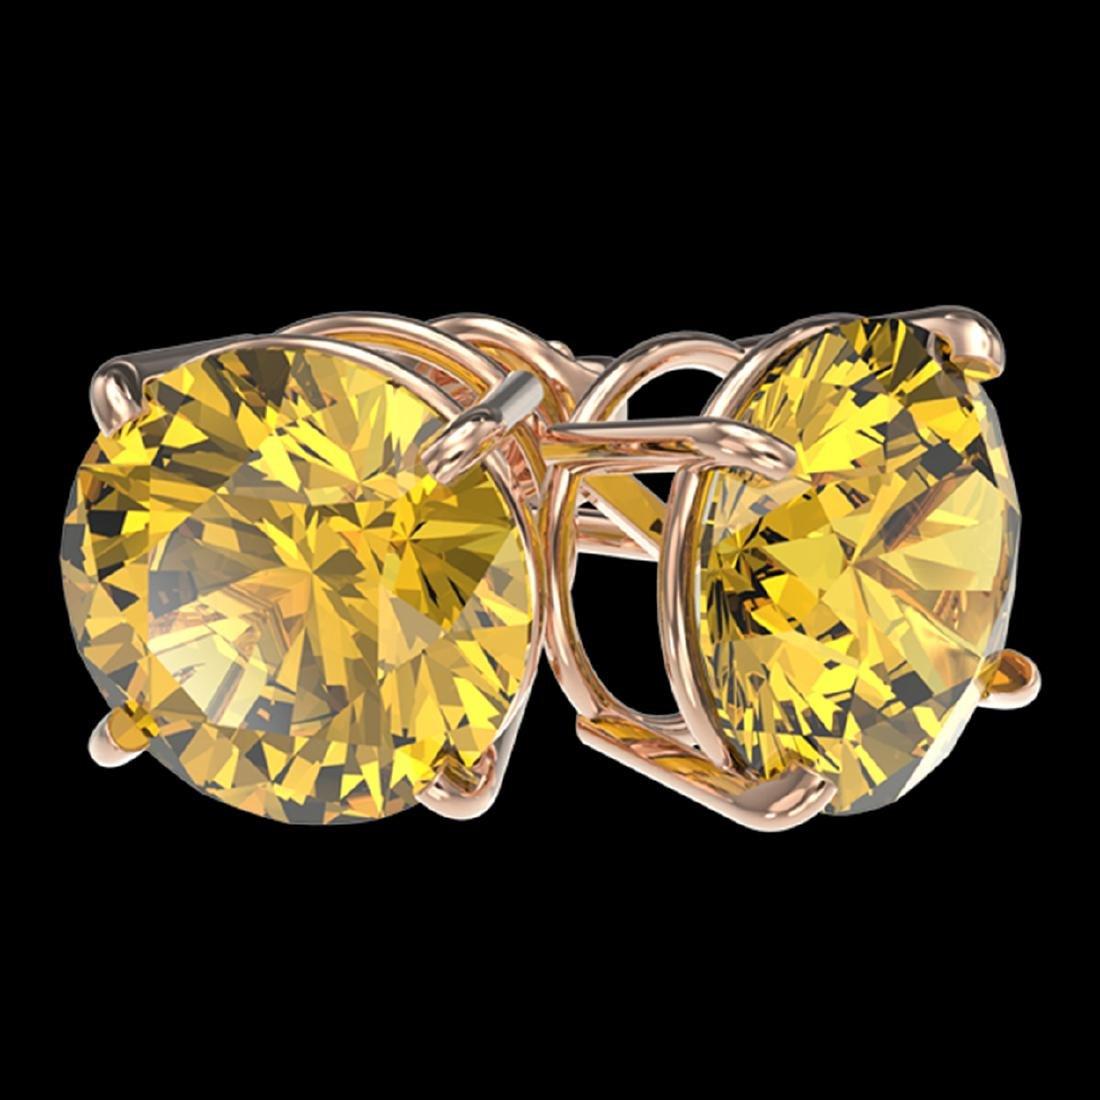 4 ctw Intense Yellow Diamond Stud Earrings 10K Rose - 3